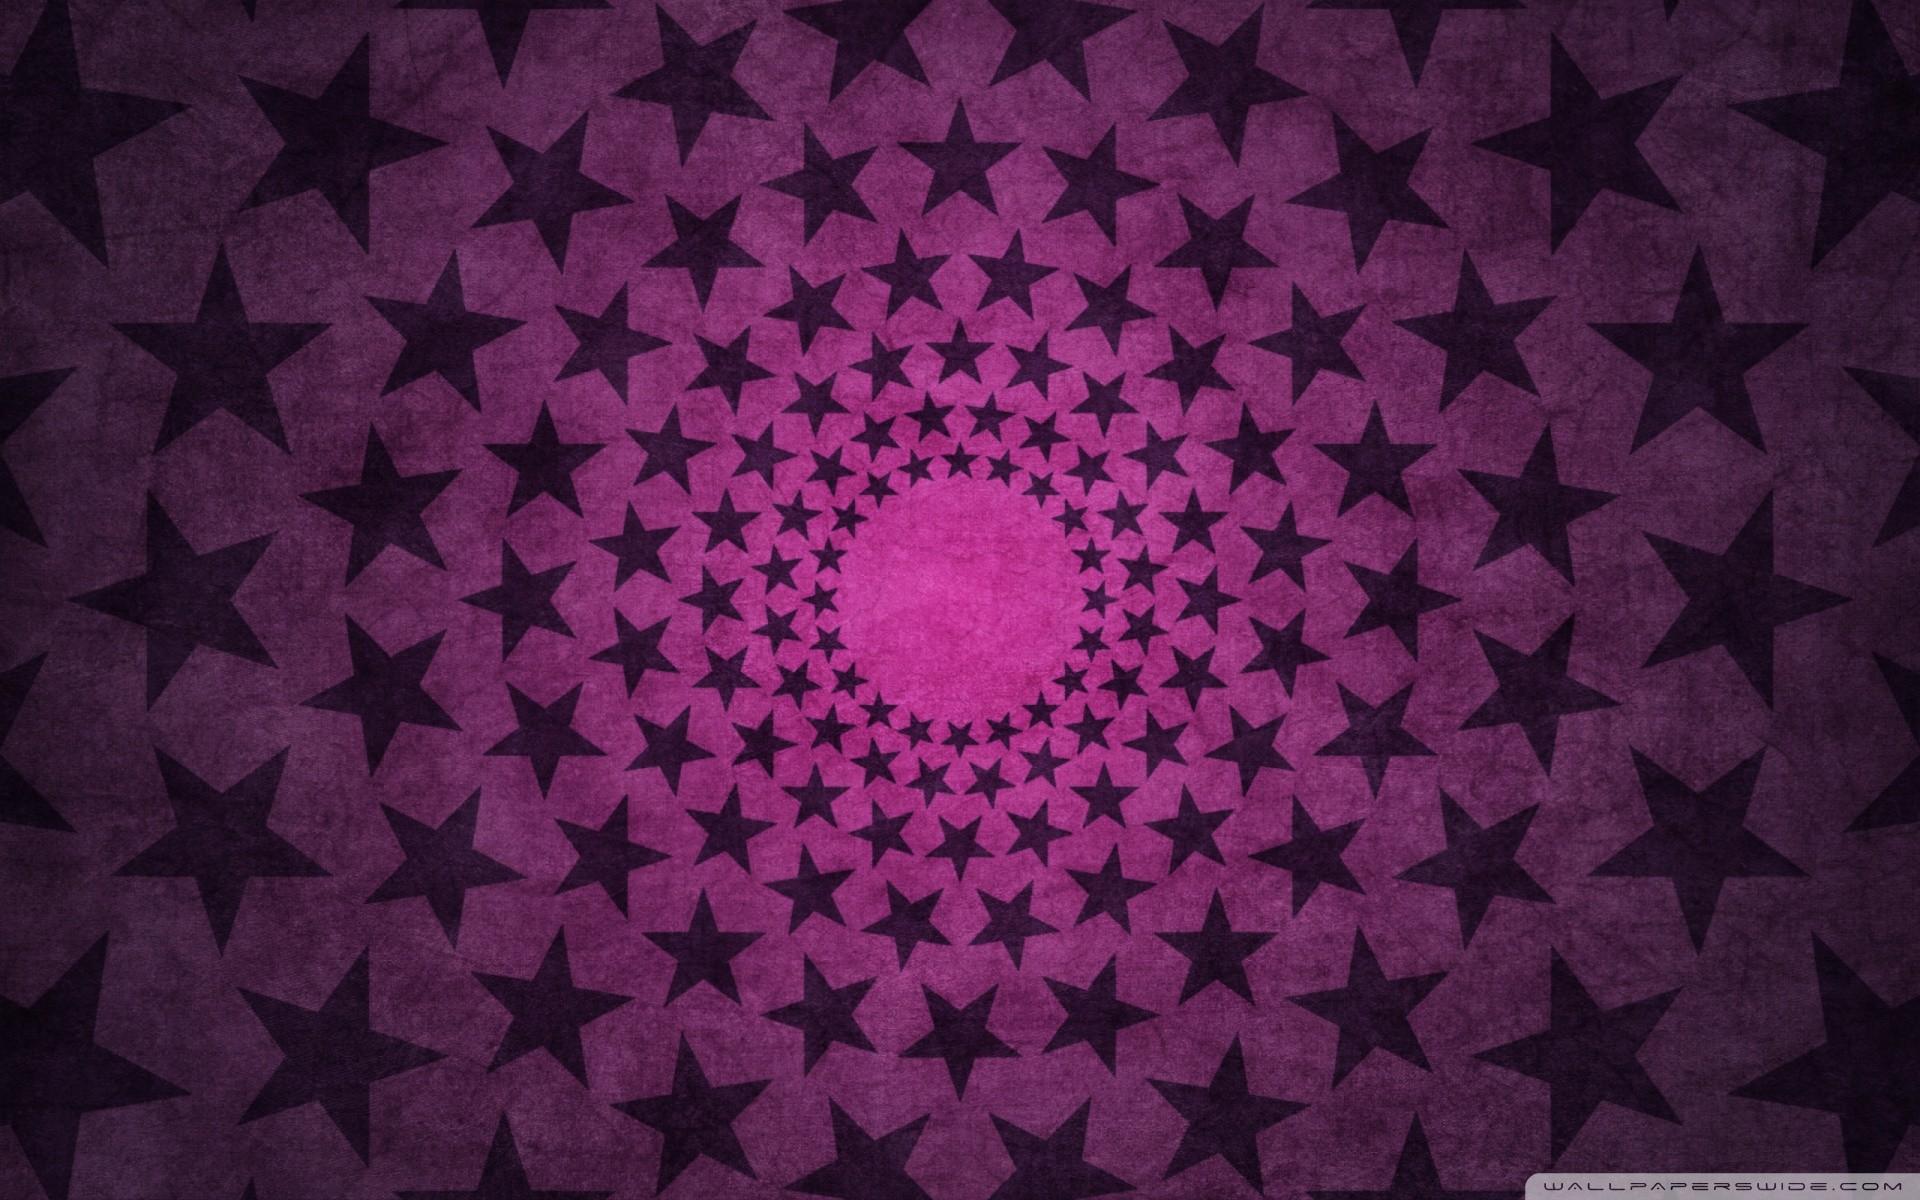 … star circles hd desktop wallpaper fullscreen …